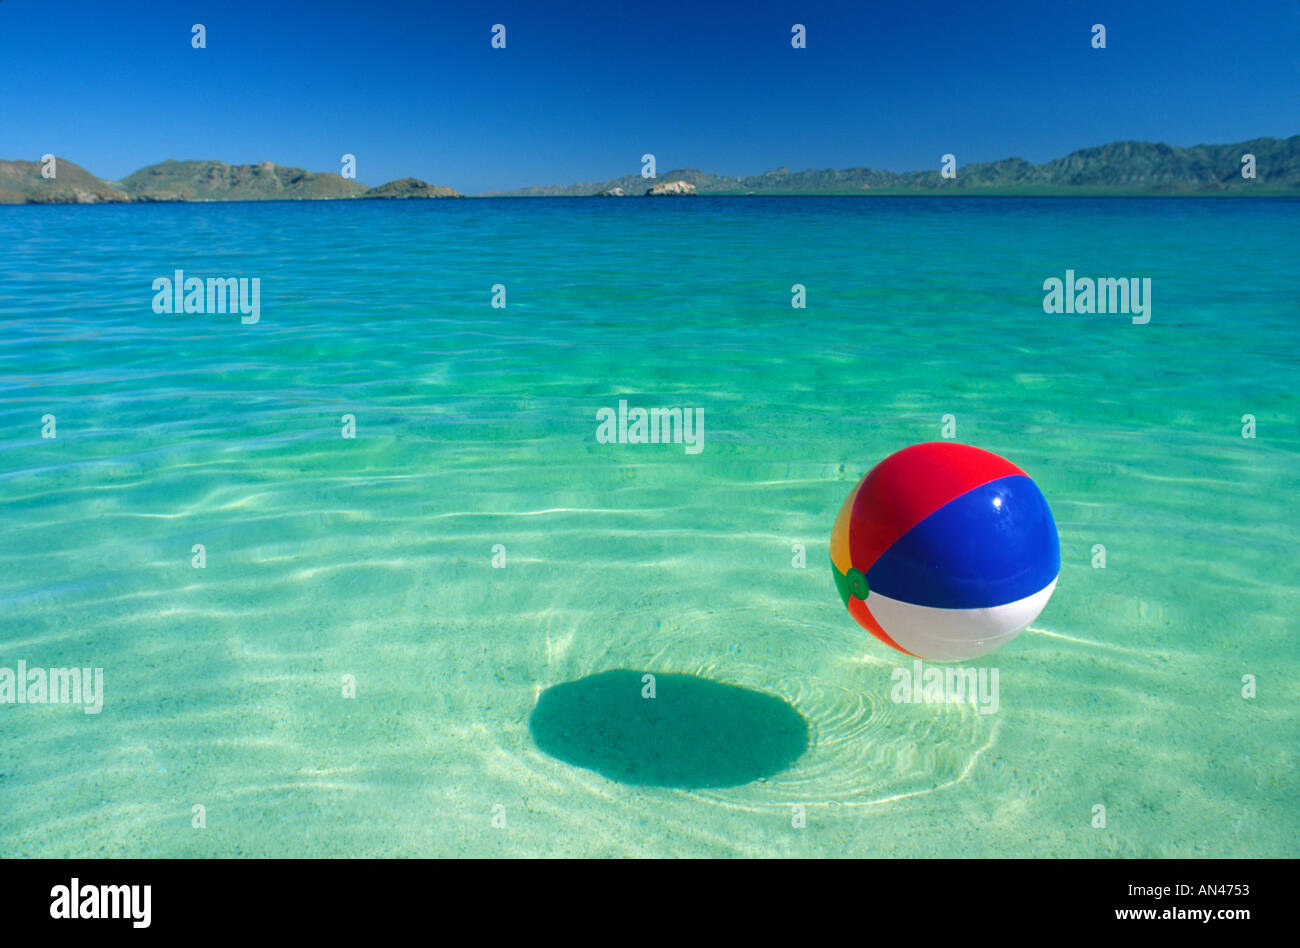 Beach ball in ocean Sand Beach Ball Floating In Tropical Water Alamy Beach Ball Floating In Tropical Water Stock Photo 1394514 Alamy